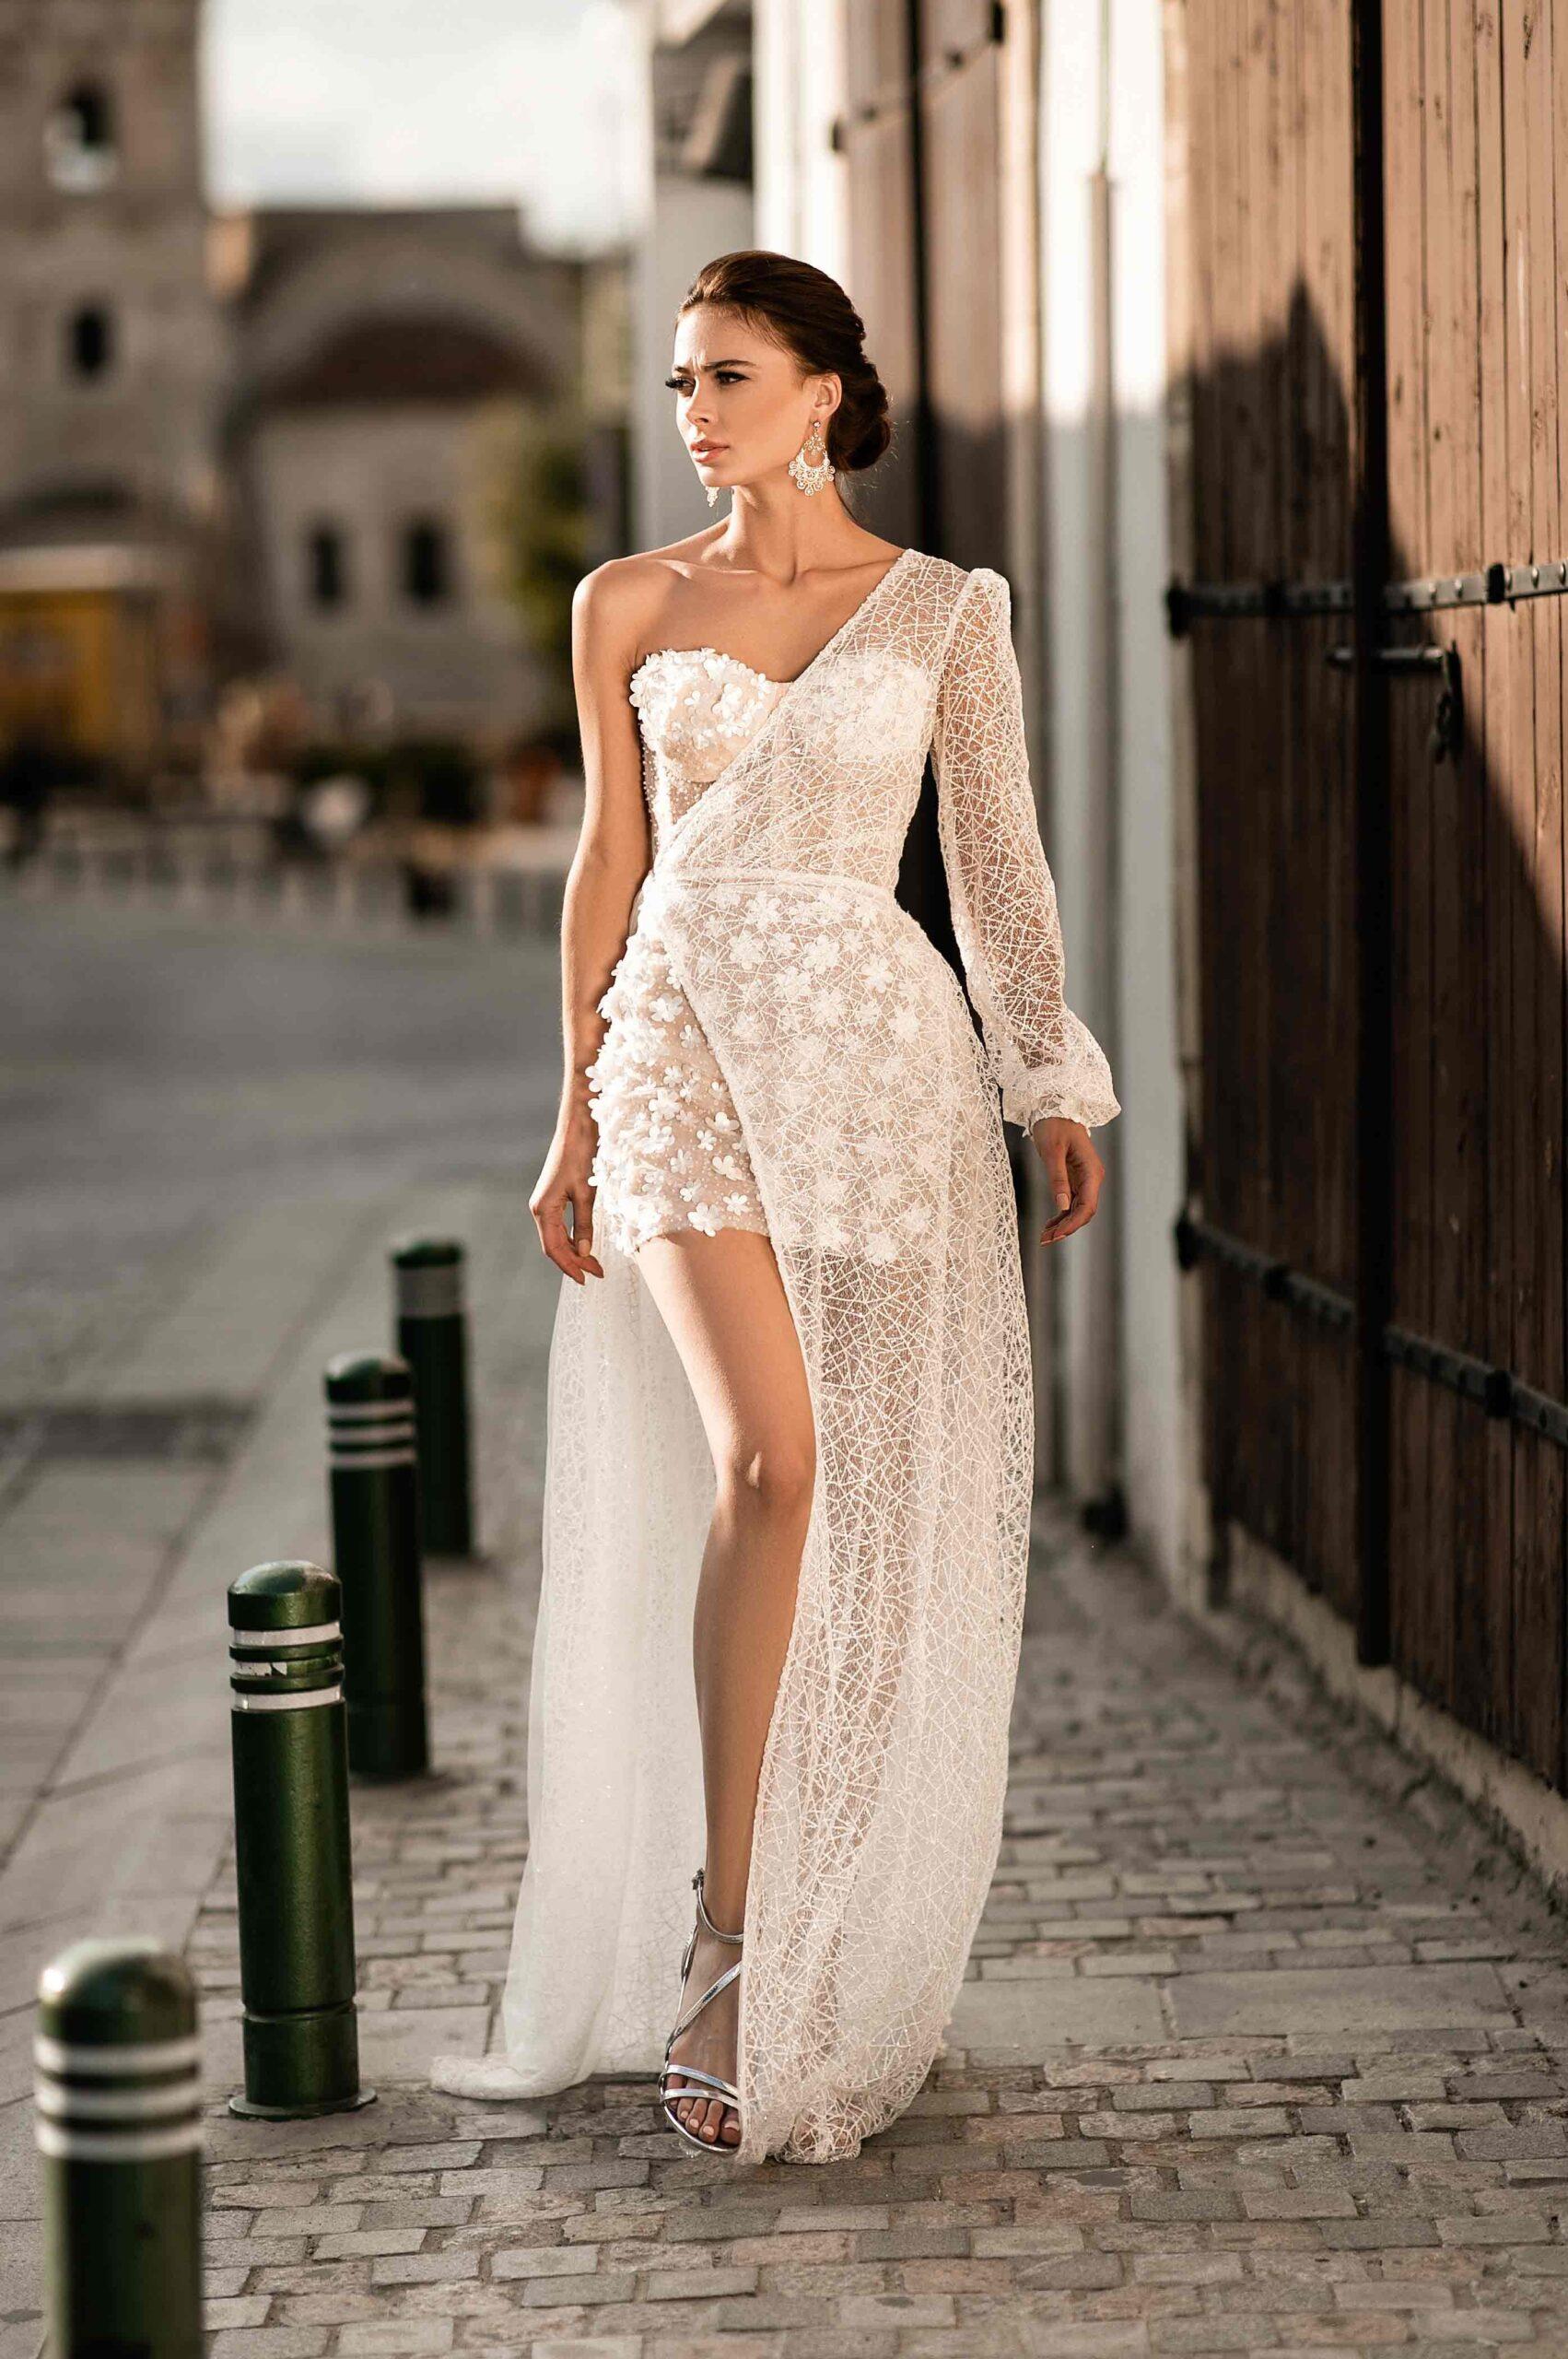 Bonnie Wedding Dress from BeverlyBride